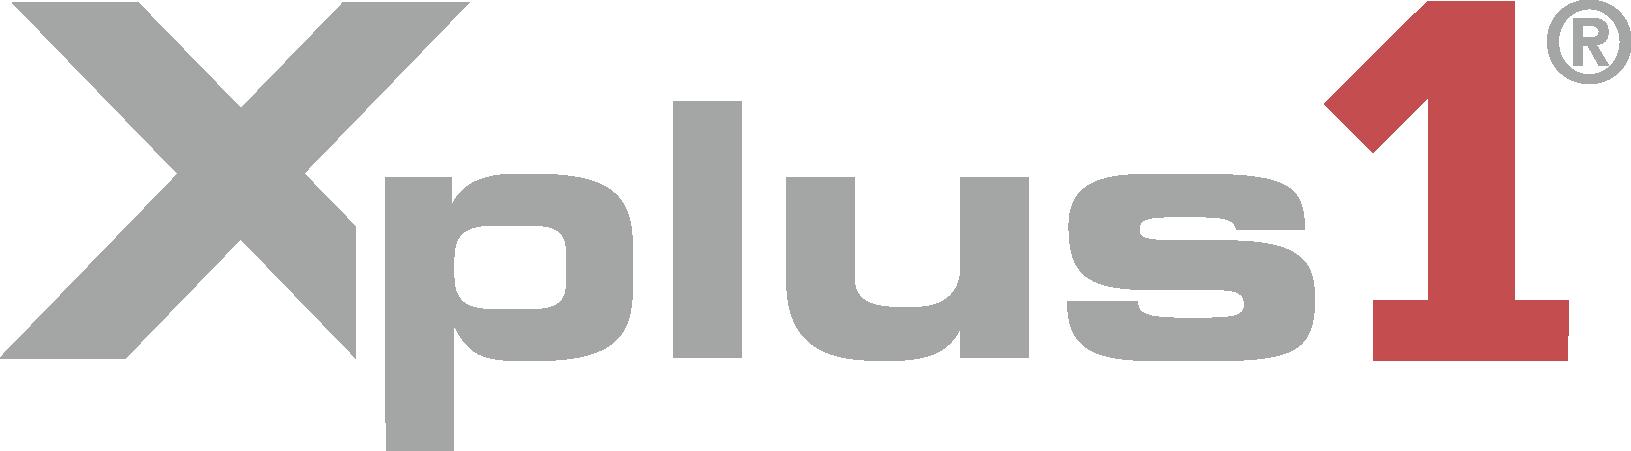 XPLUS1 Telekom